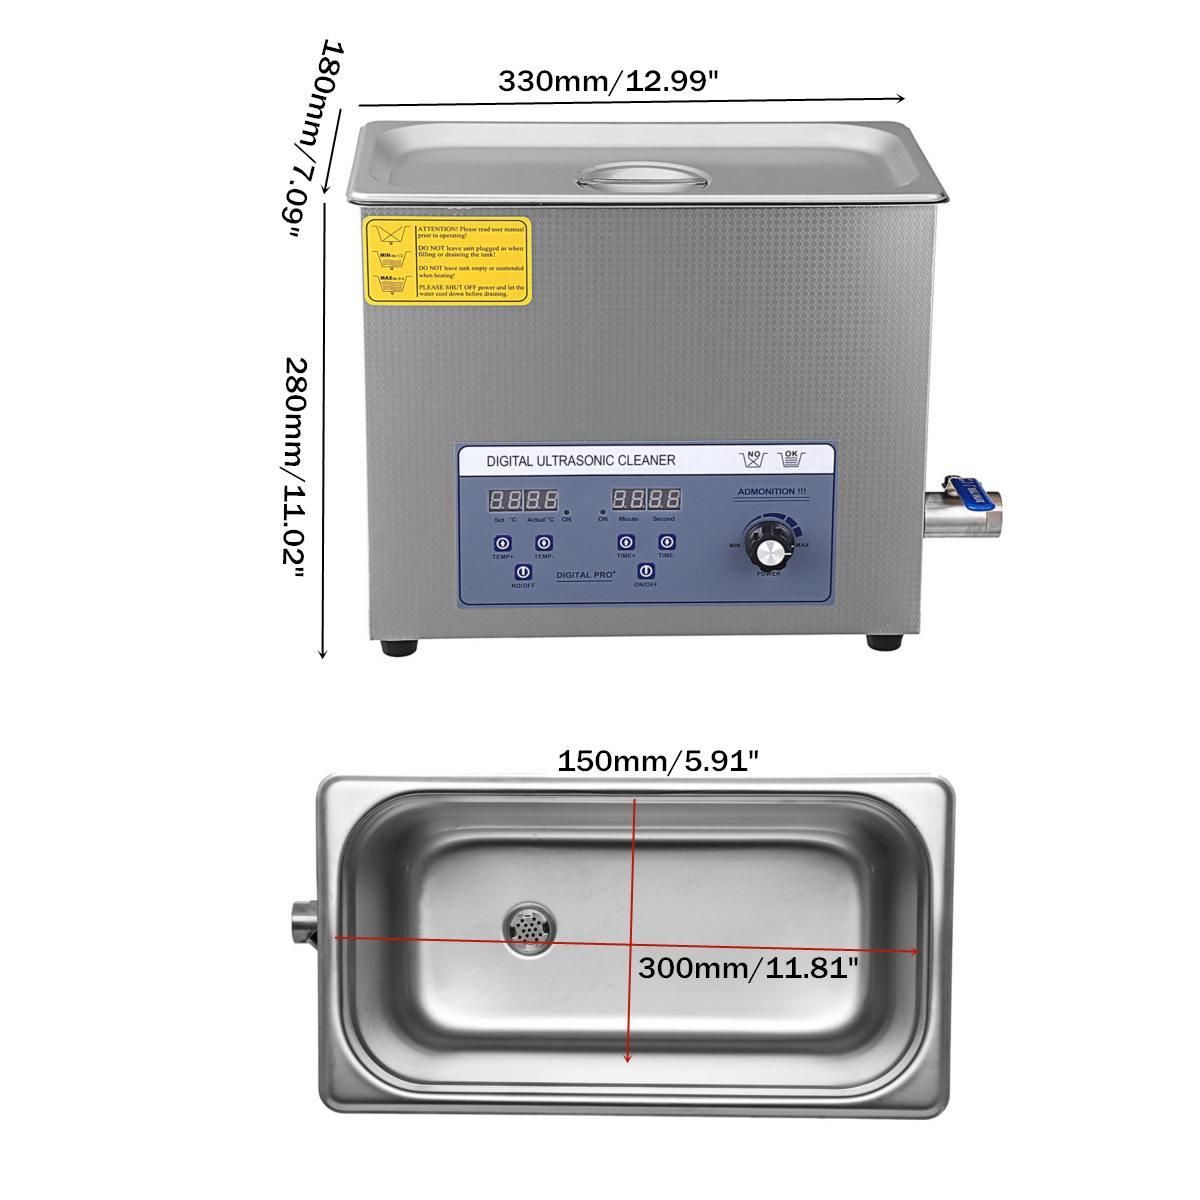 Profissional de 6l 220 v liftable lp álbum disco digital ultra sônico mais limpo vinil registro lavagem ultra som máquina limpeza portátil - 5